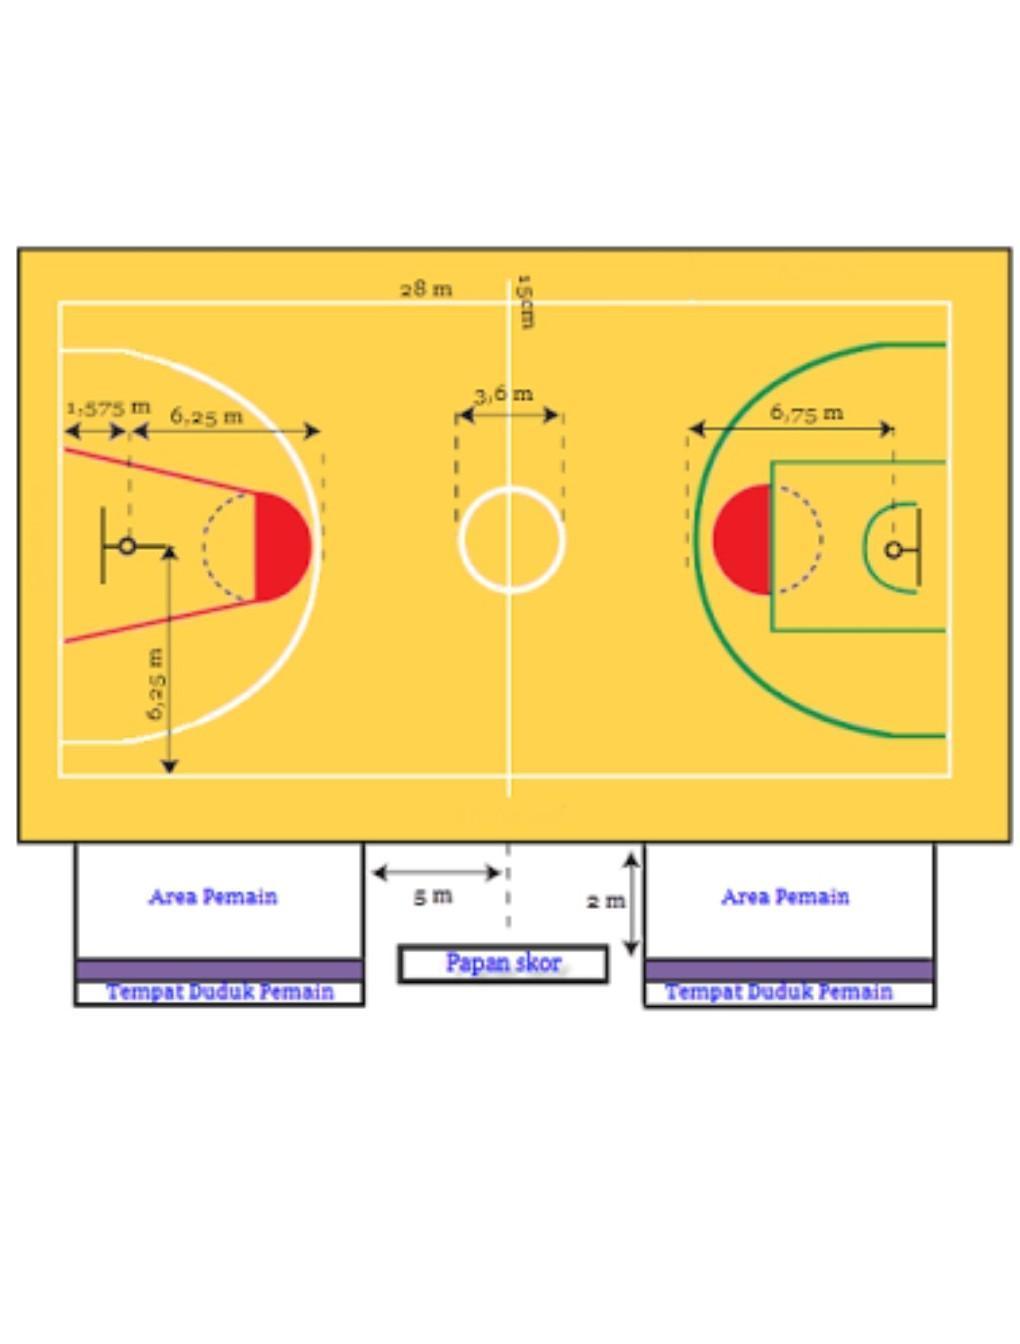 Gambar Lapangan Beserta Ukurannya : gambar, lapangan, beserta, ukurannya, Gambar, Lapangan, Basket, Beserta, Ukurannya, Brainly.co.id